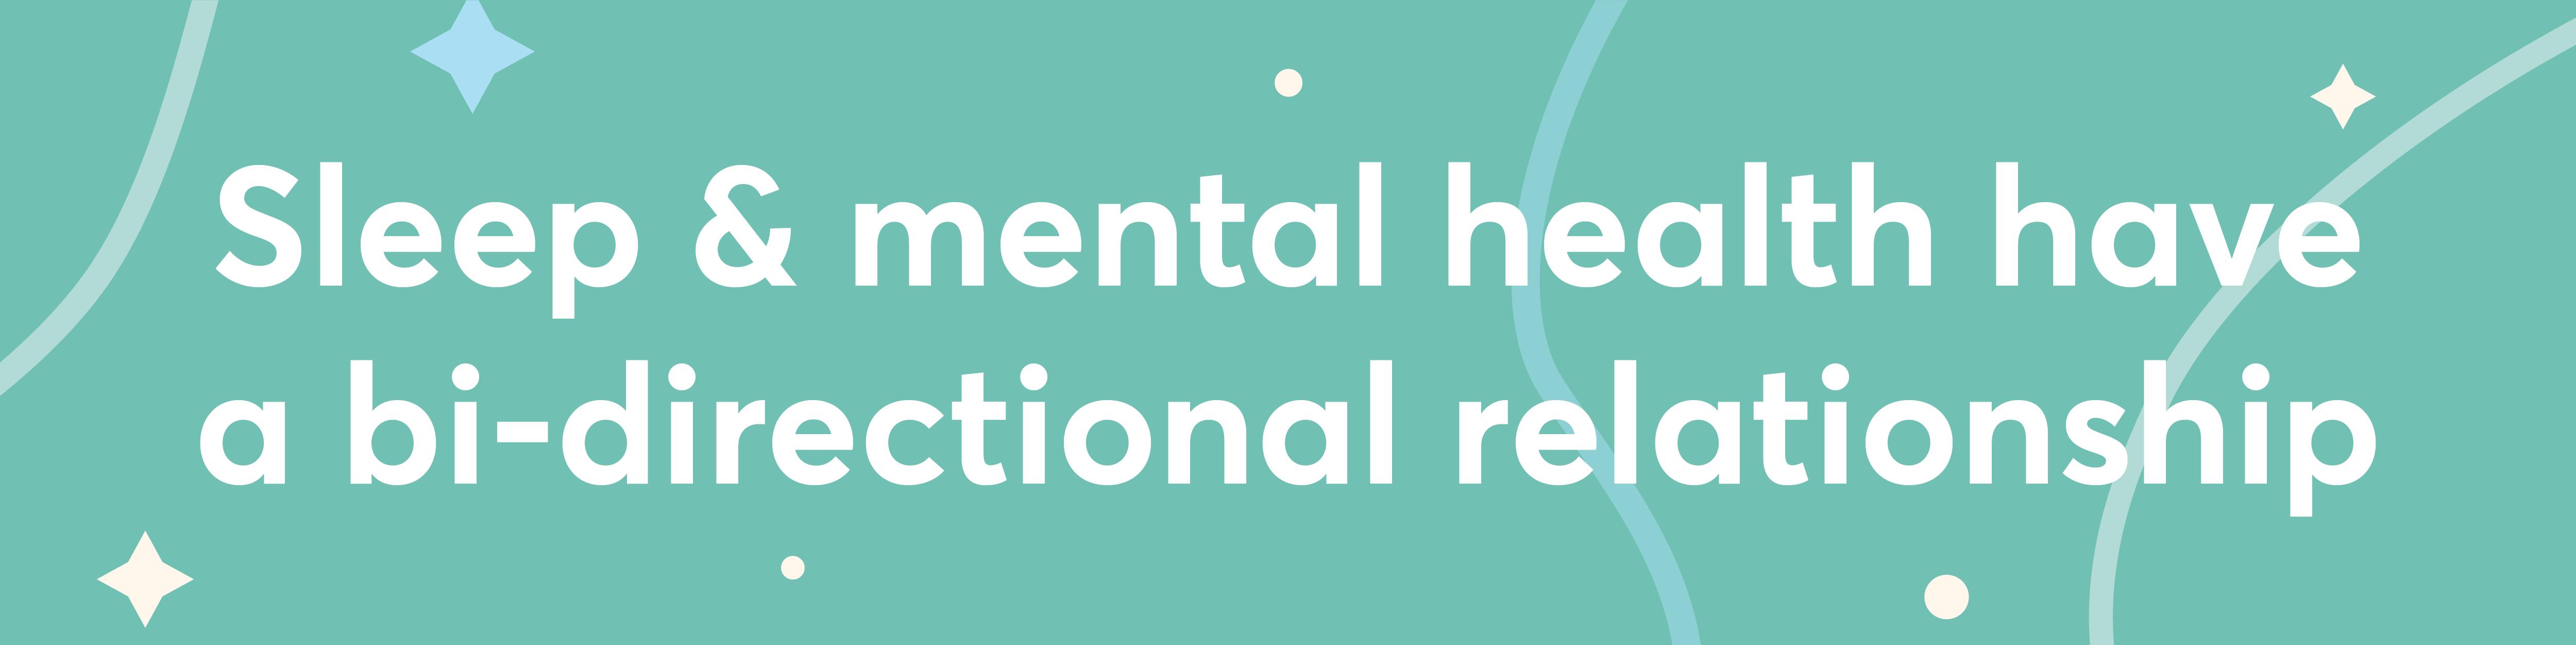 Shleep: sleep and mental health have a bi-directional relationship